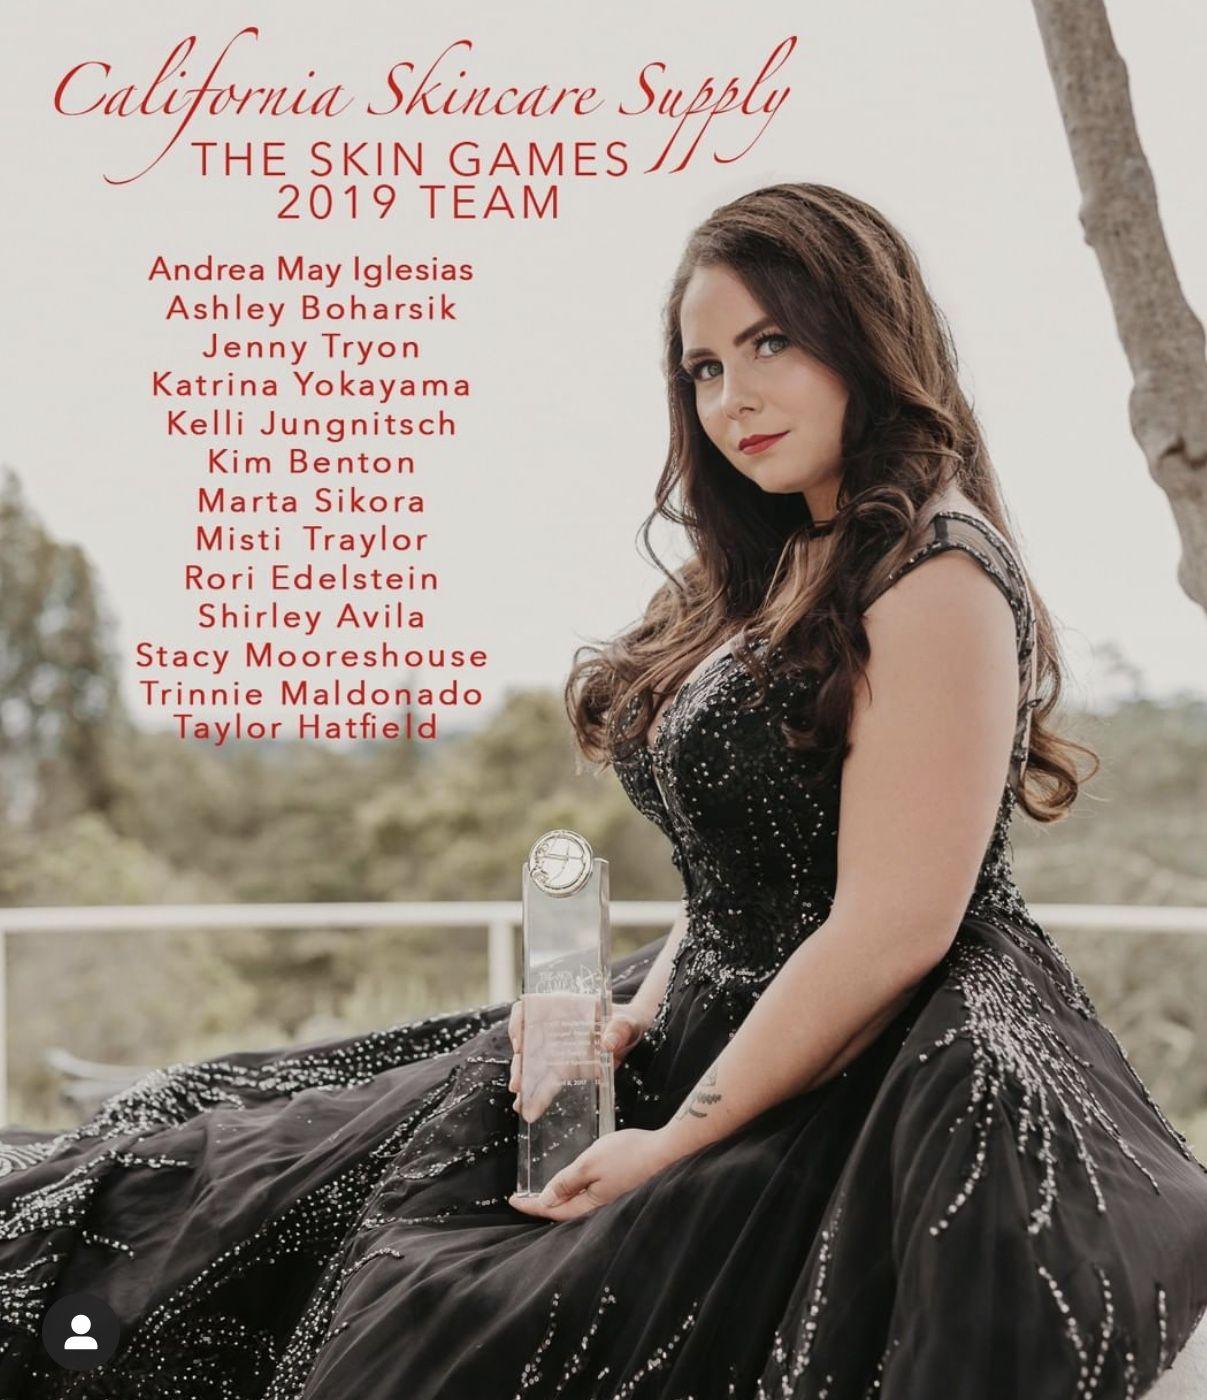 CSS Team Members in the Skin Games 2019